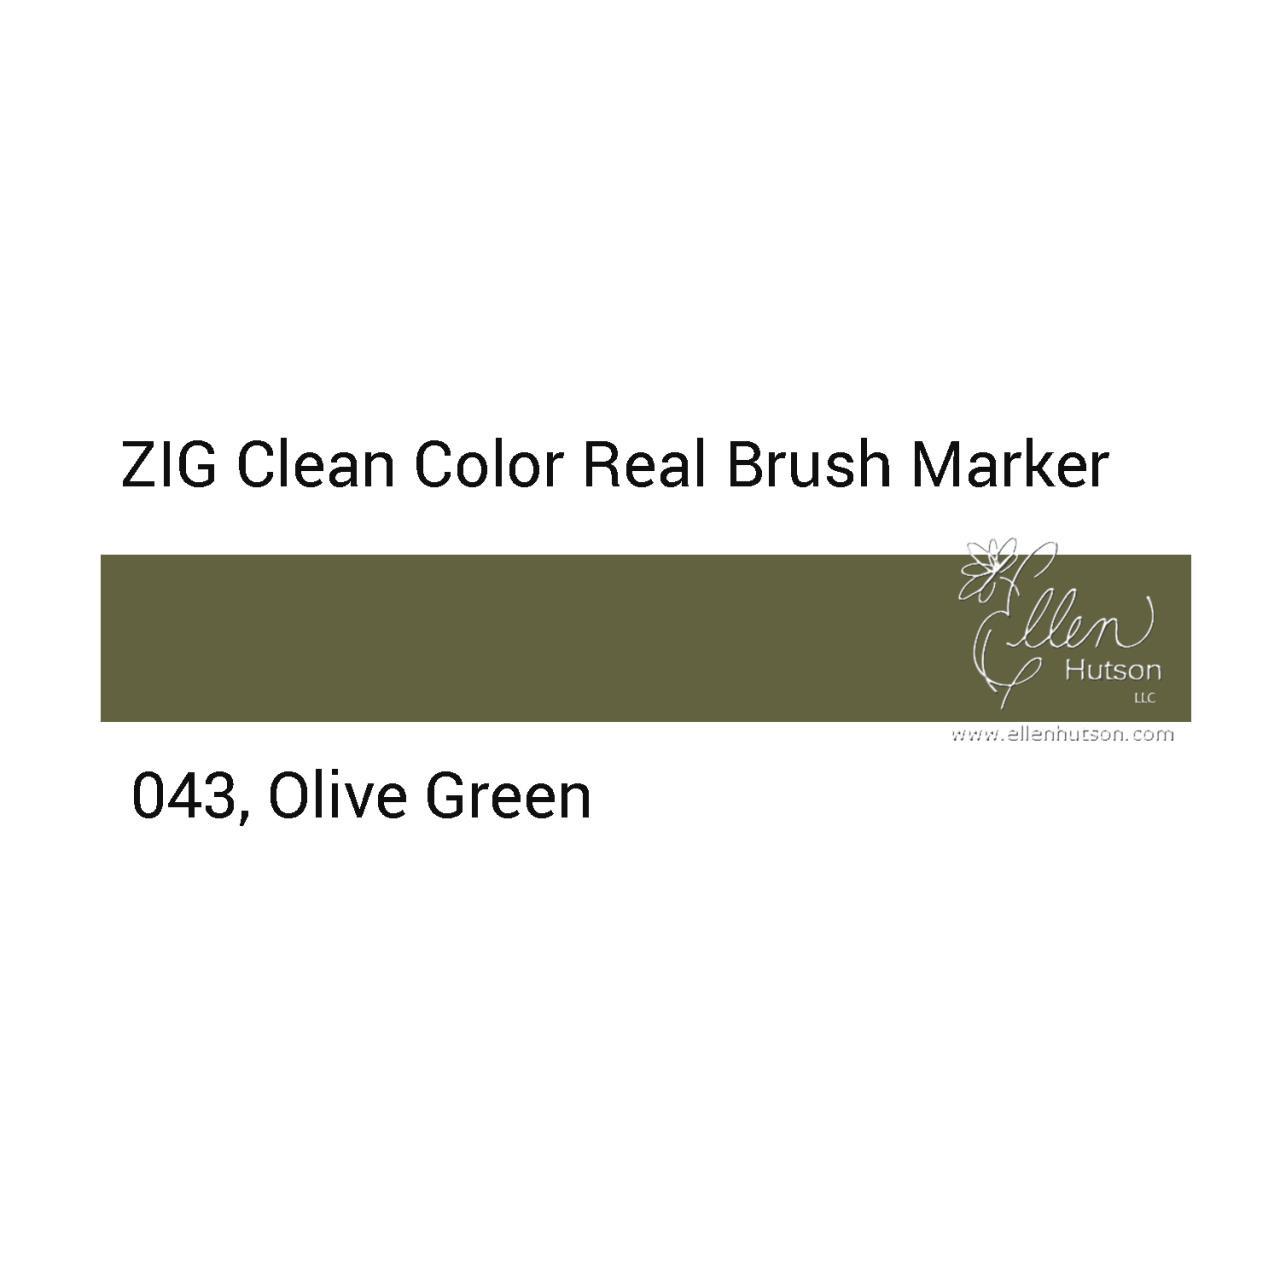 043 - Olive Green, ZIG Clean Color Real Brush Marker -